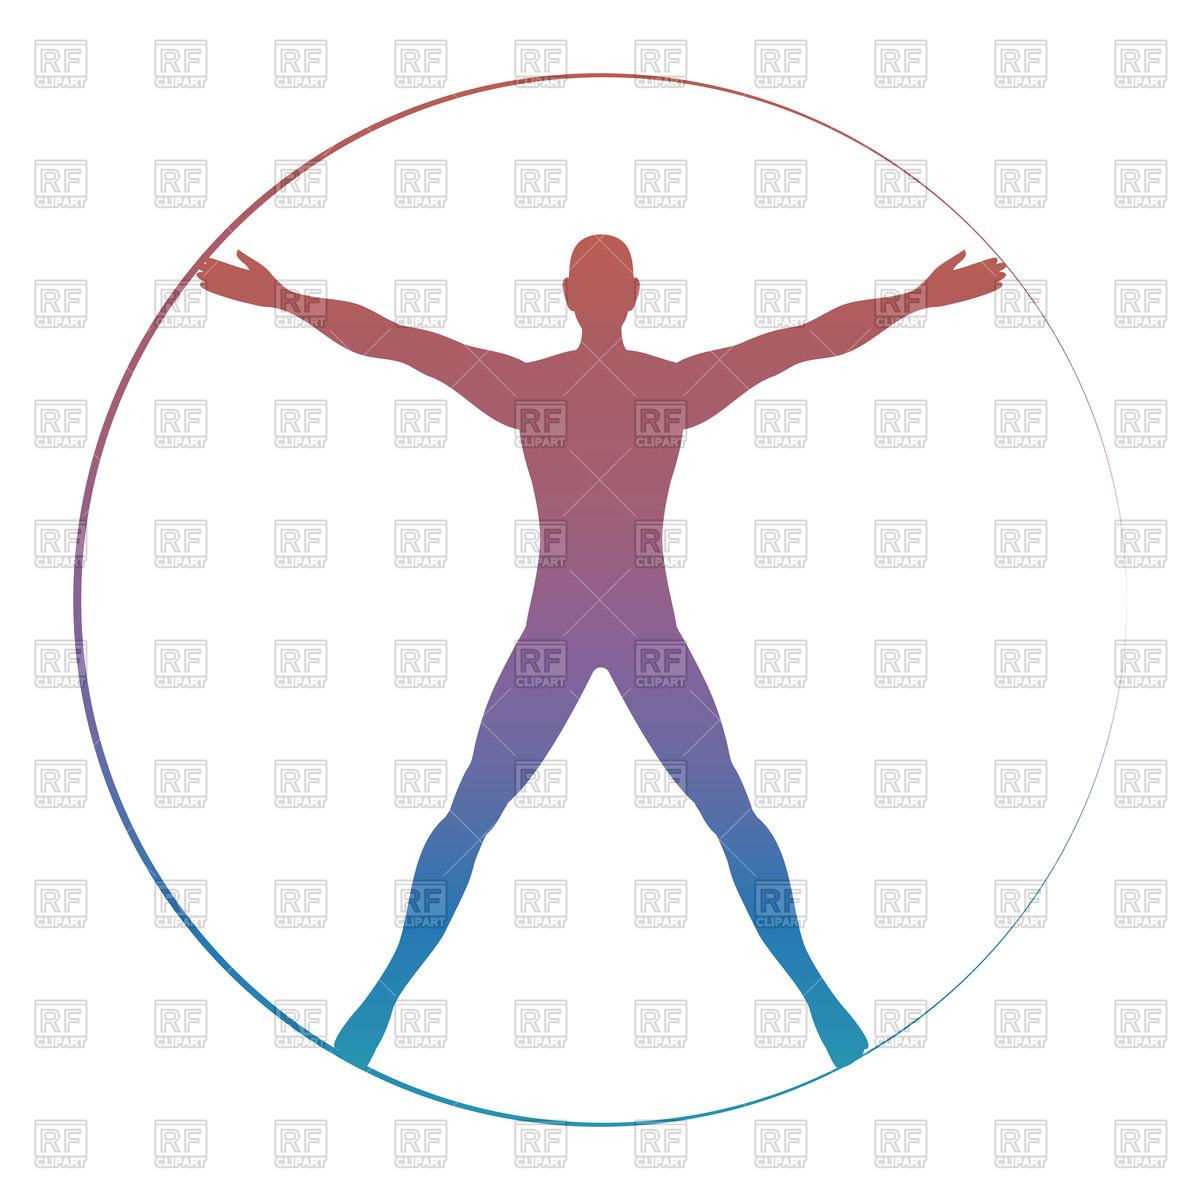 1200x1200 Modern Colorful Vitruvian Man Vector Image Vector Artwork Of